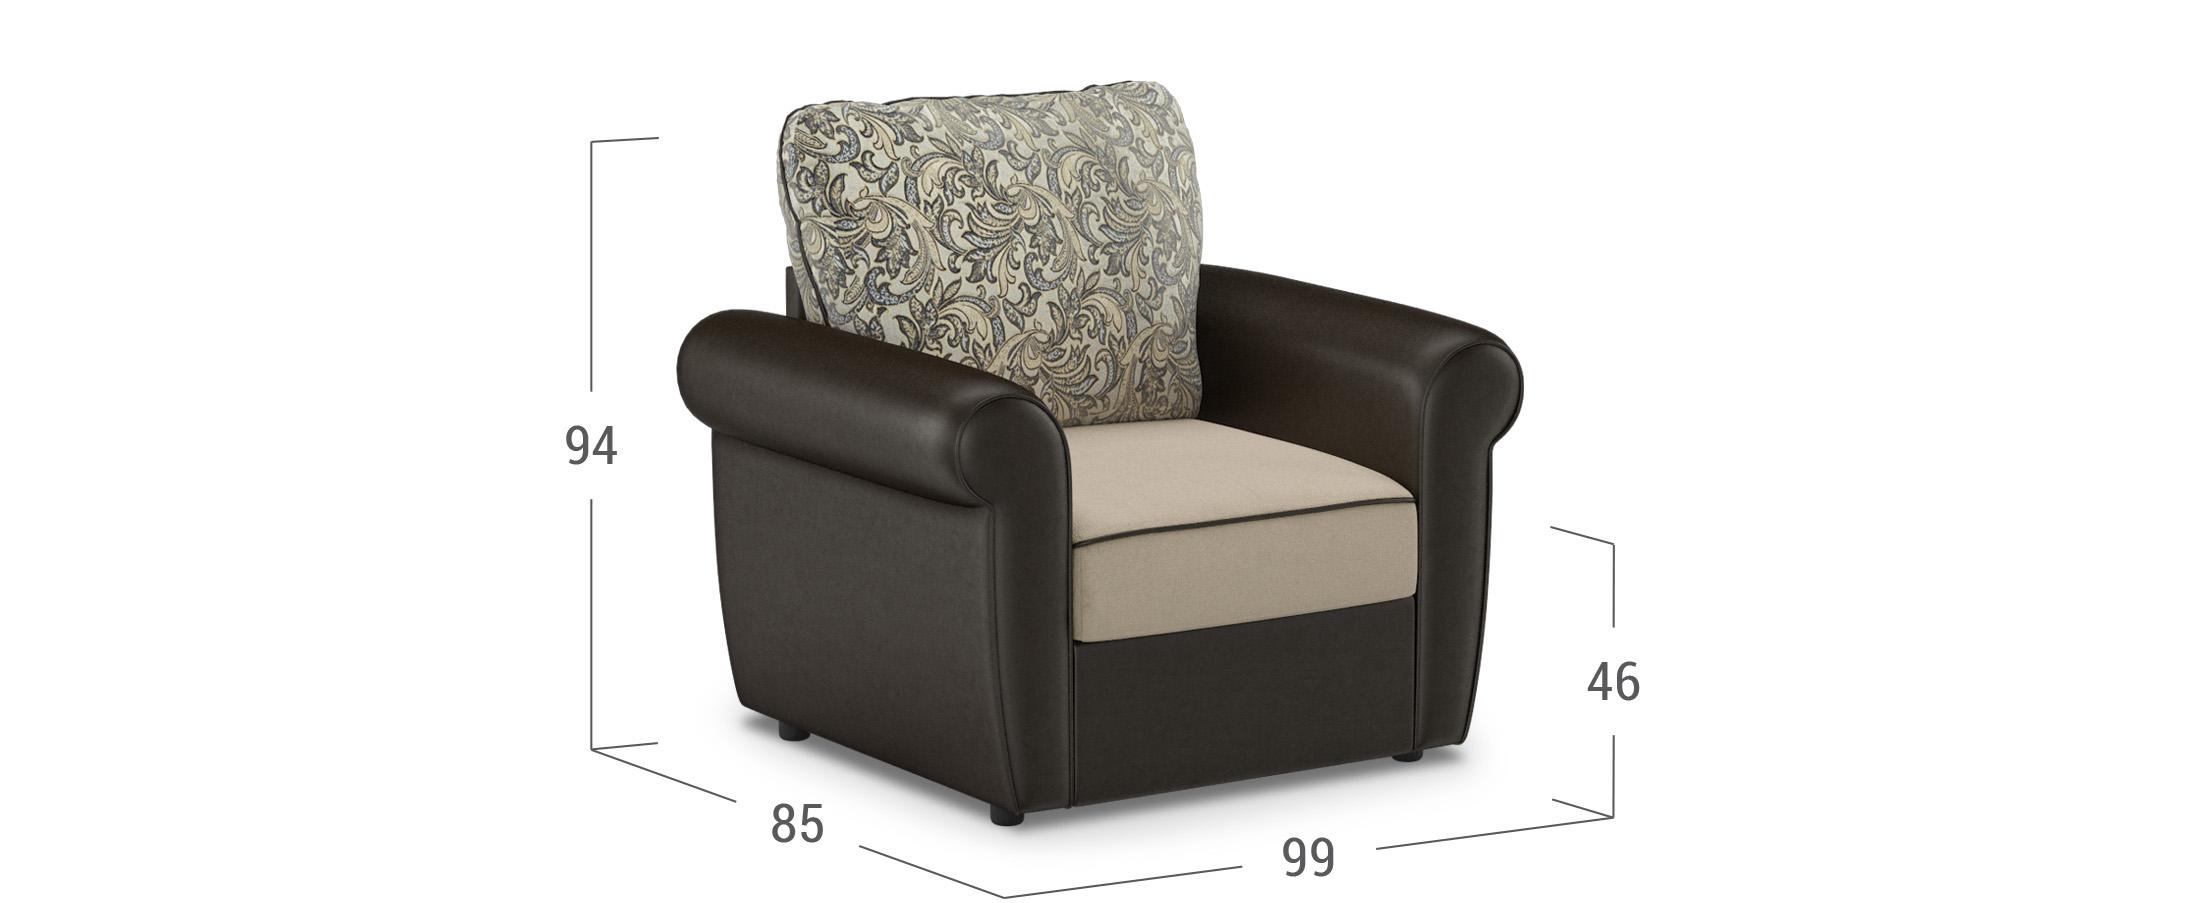 Кресло тканевое Гамбург 123